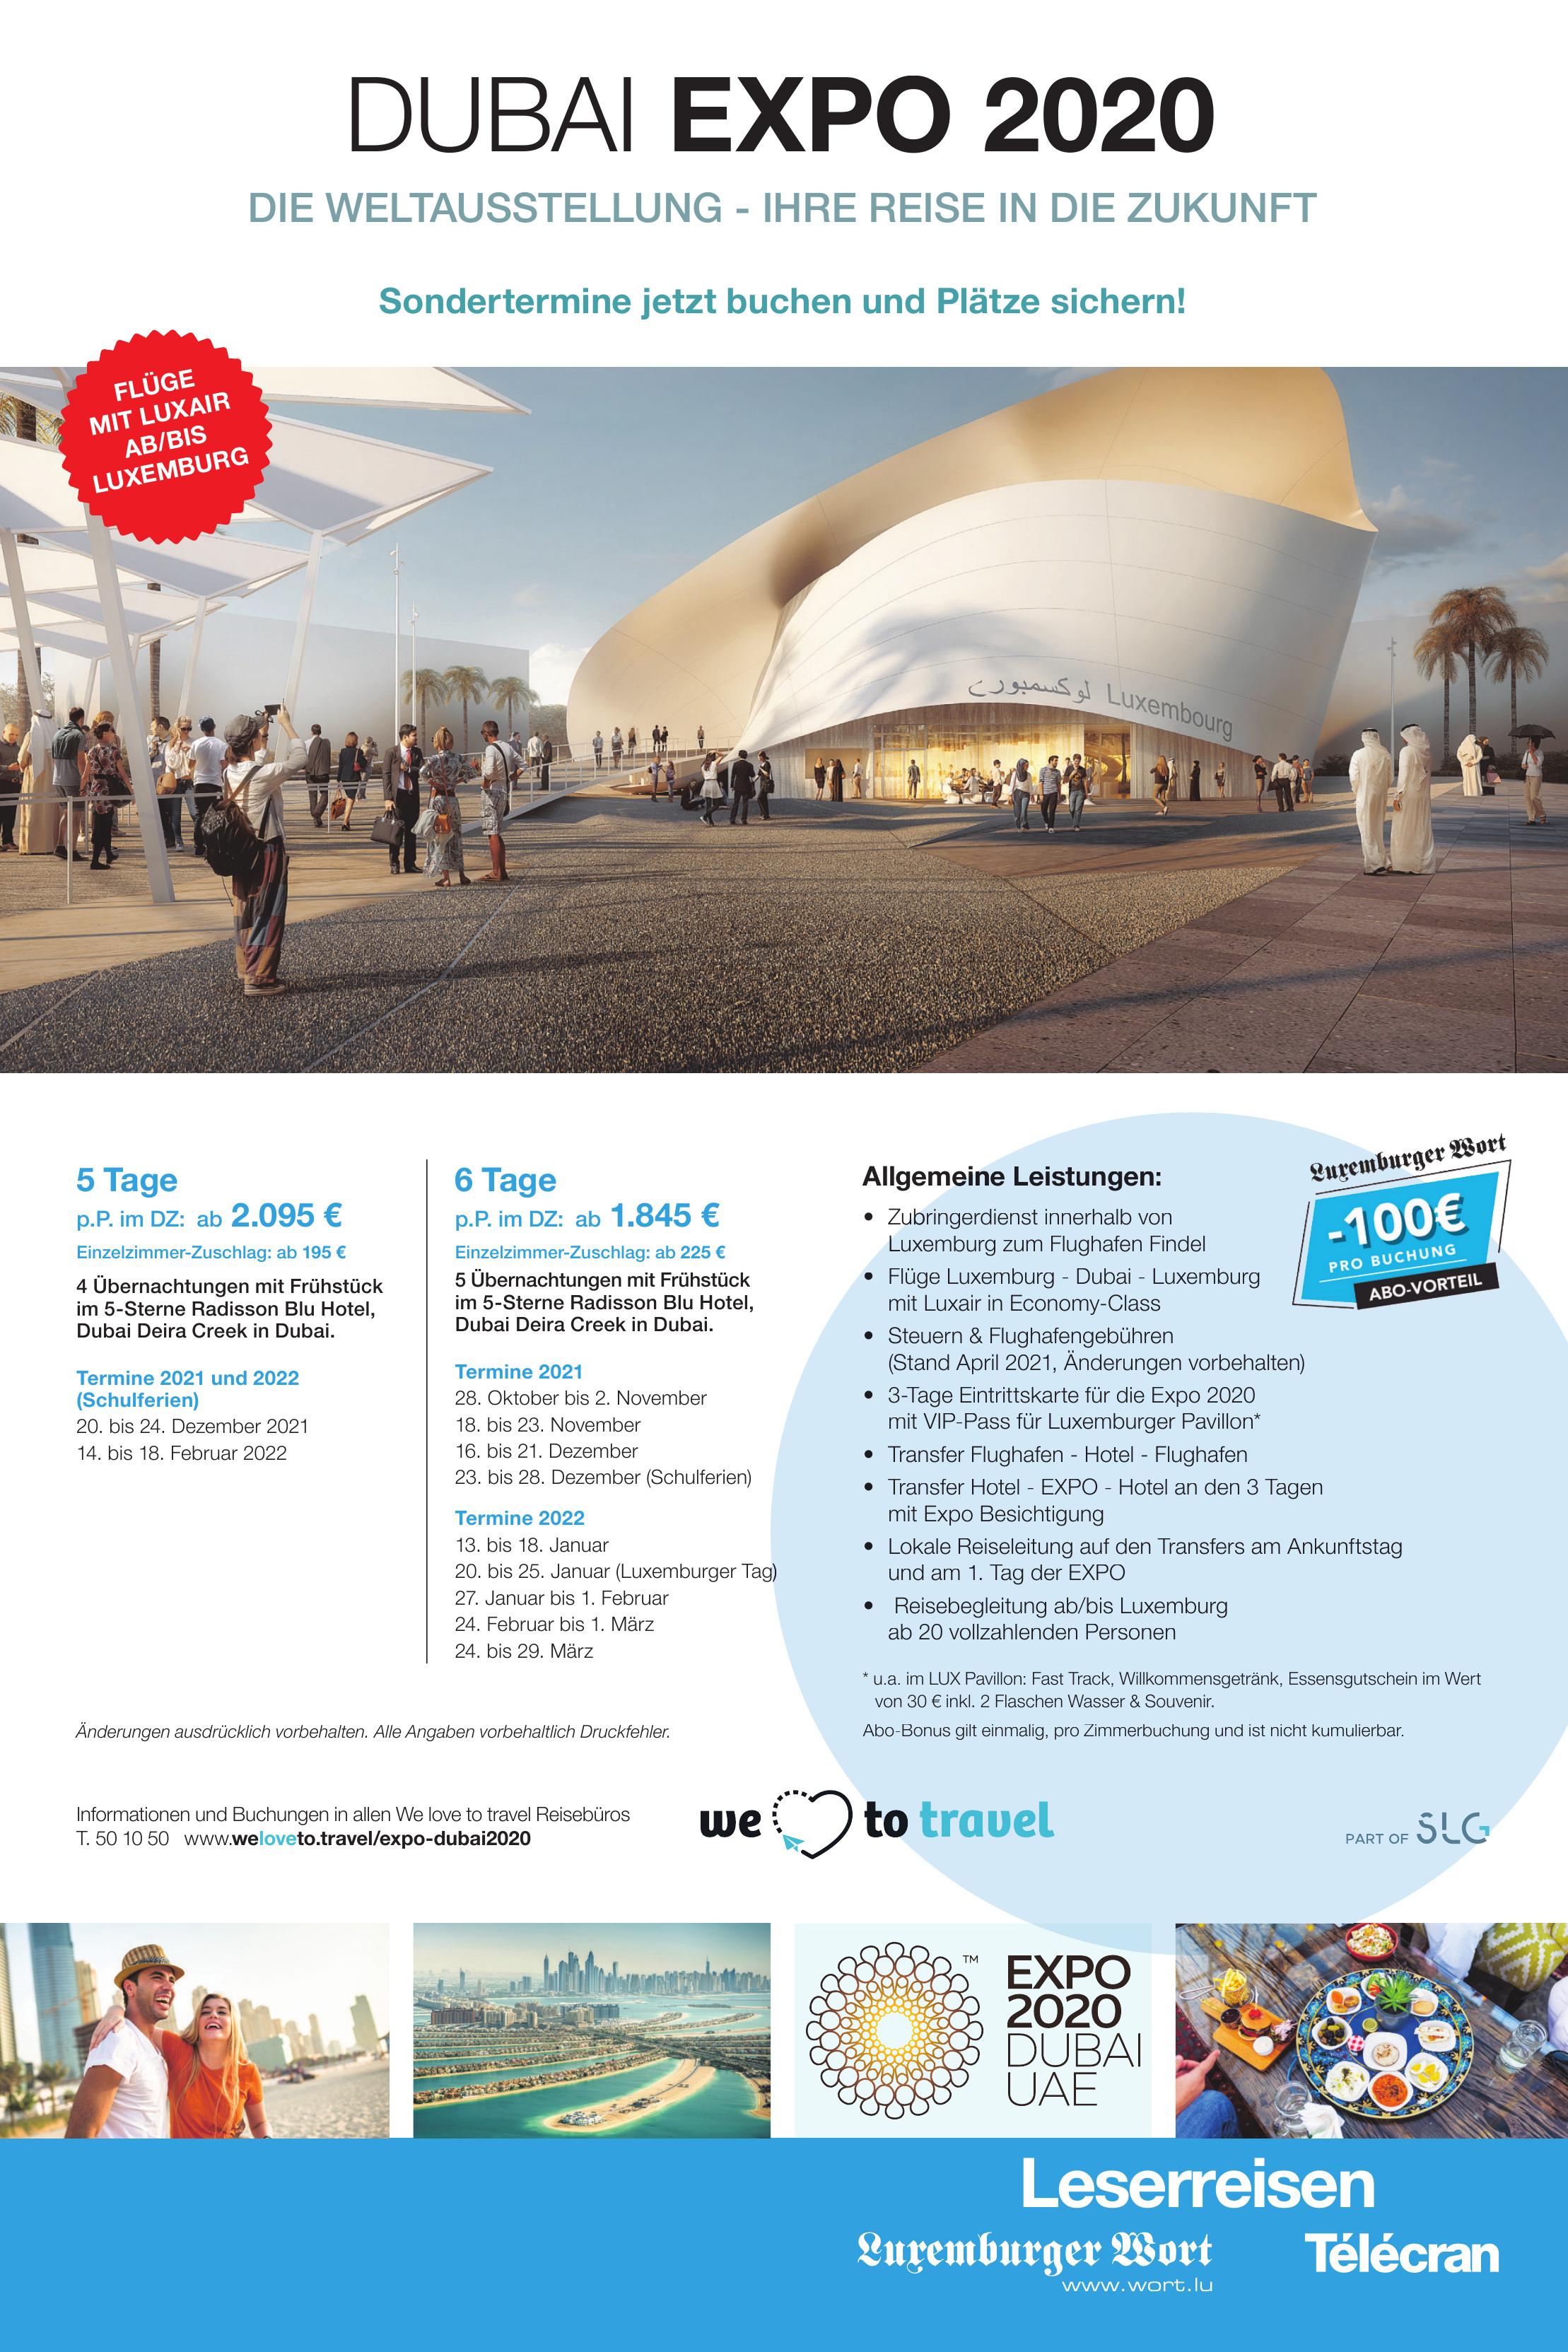 We love to travel - Dubai EXPO 2020